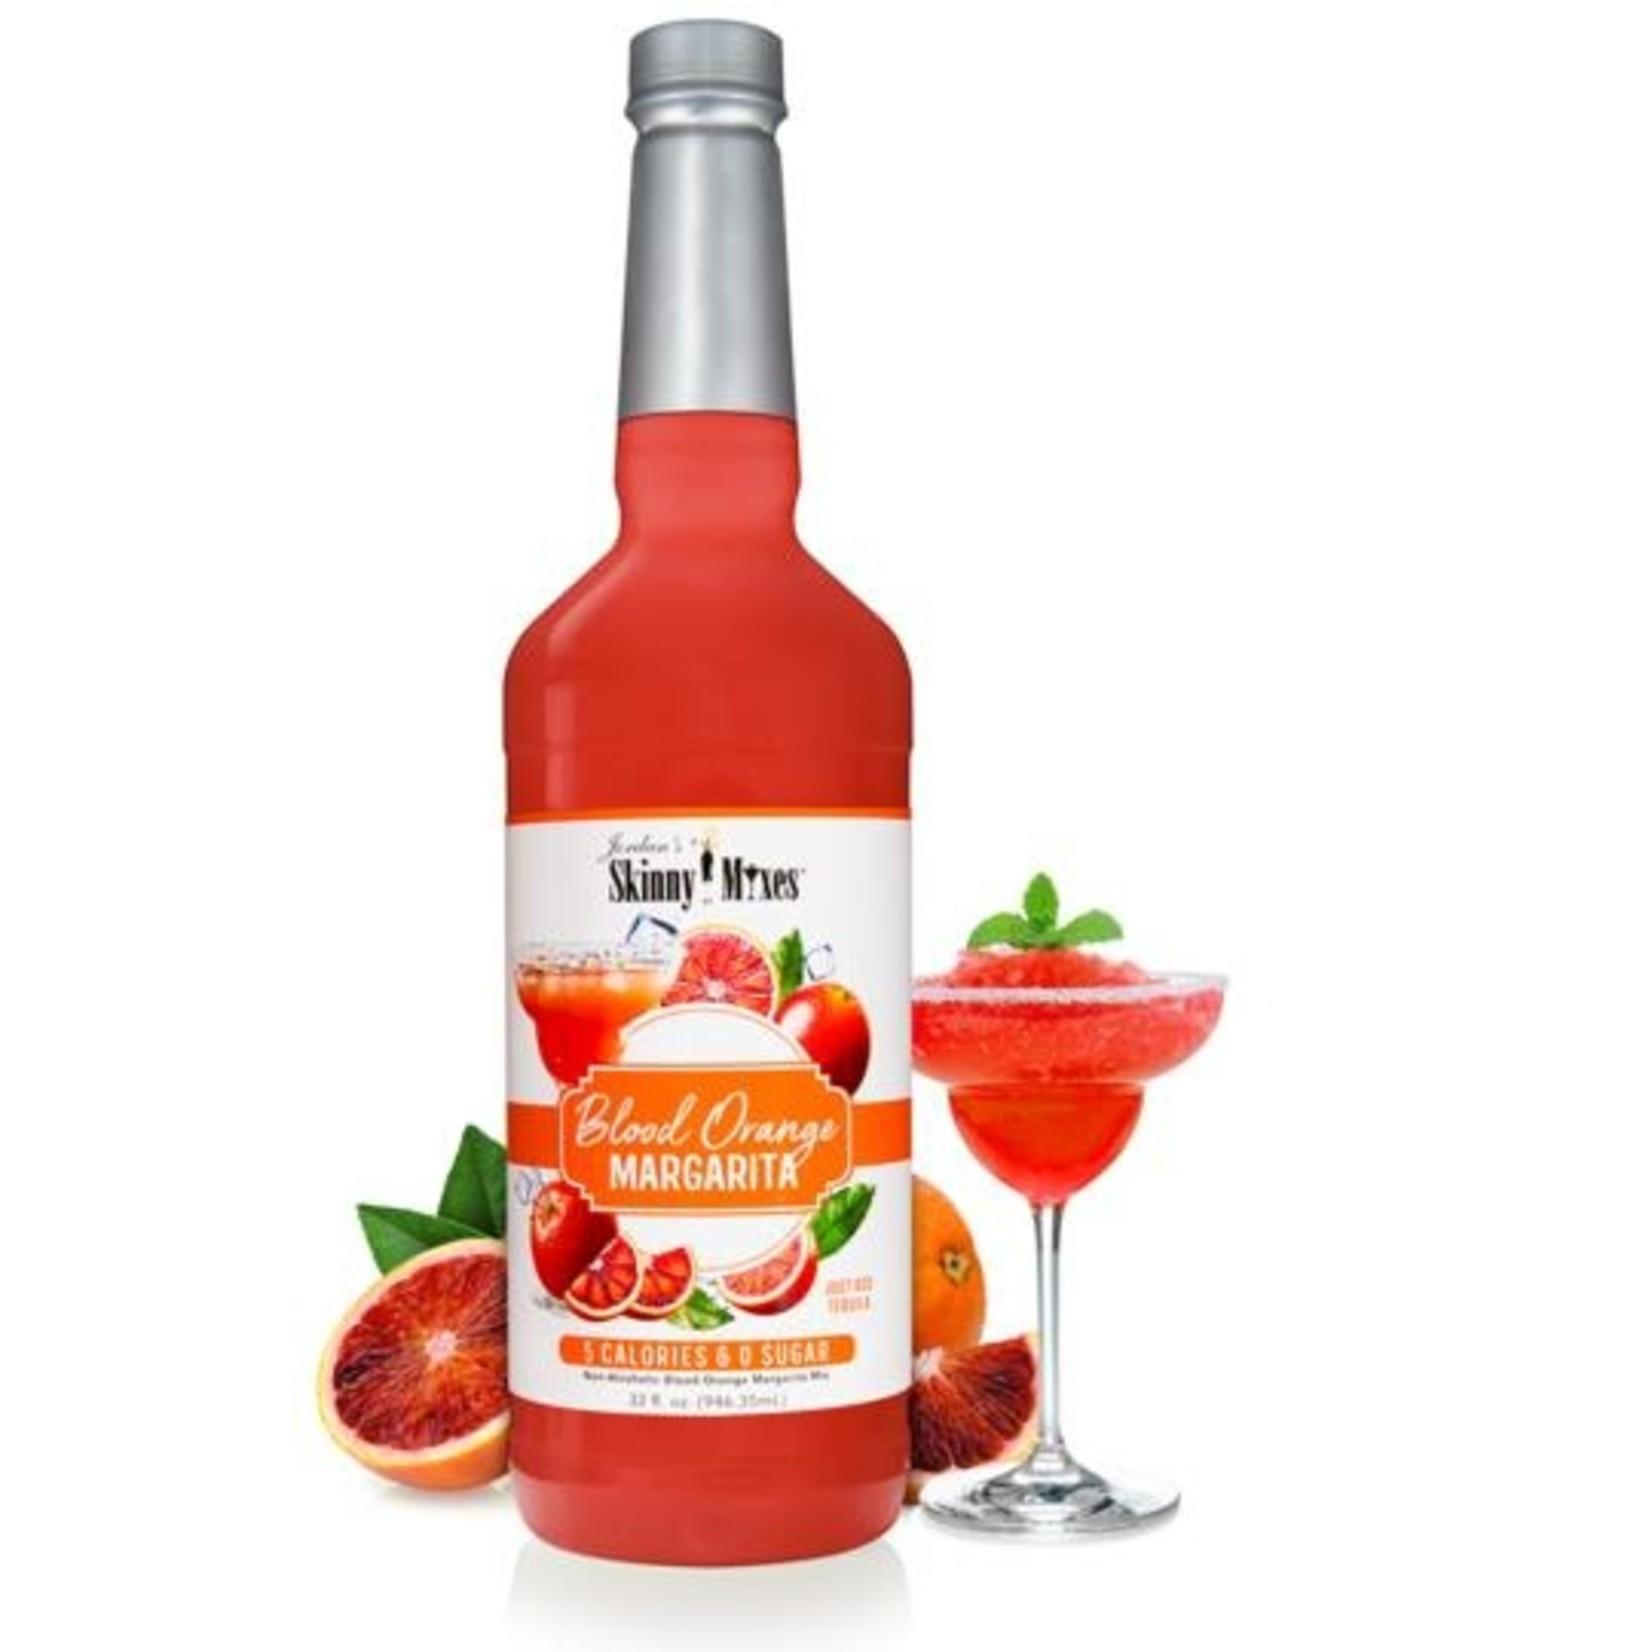 Jordan's Skinny Mixes Skinny Blood Orange Margarita Mix